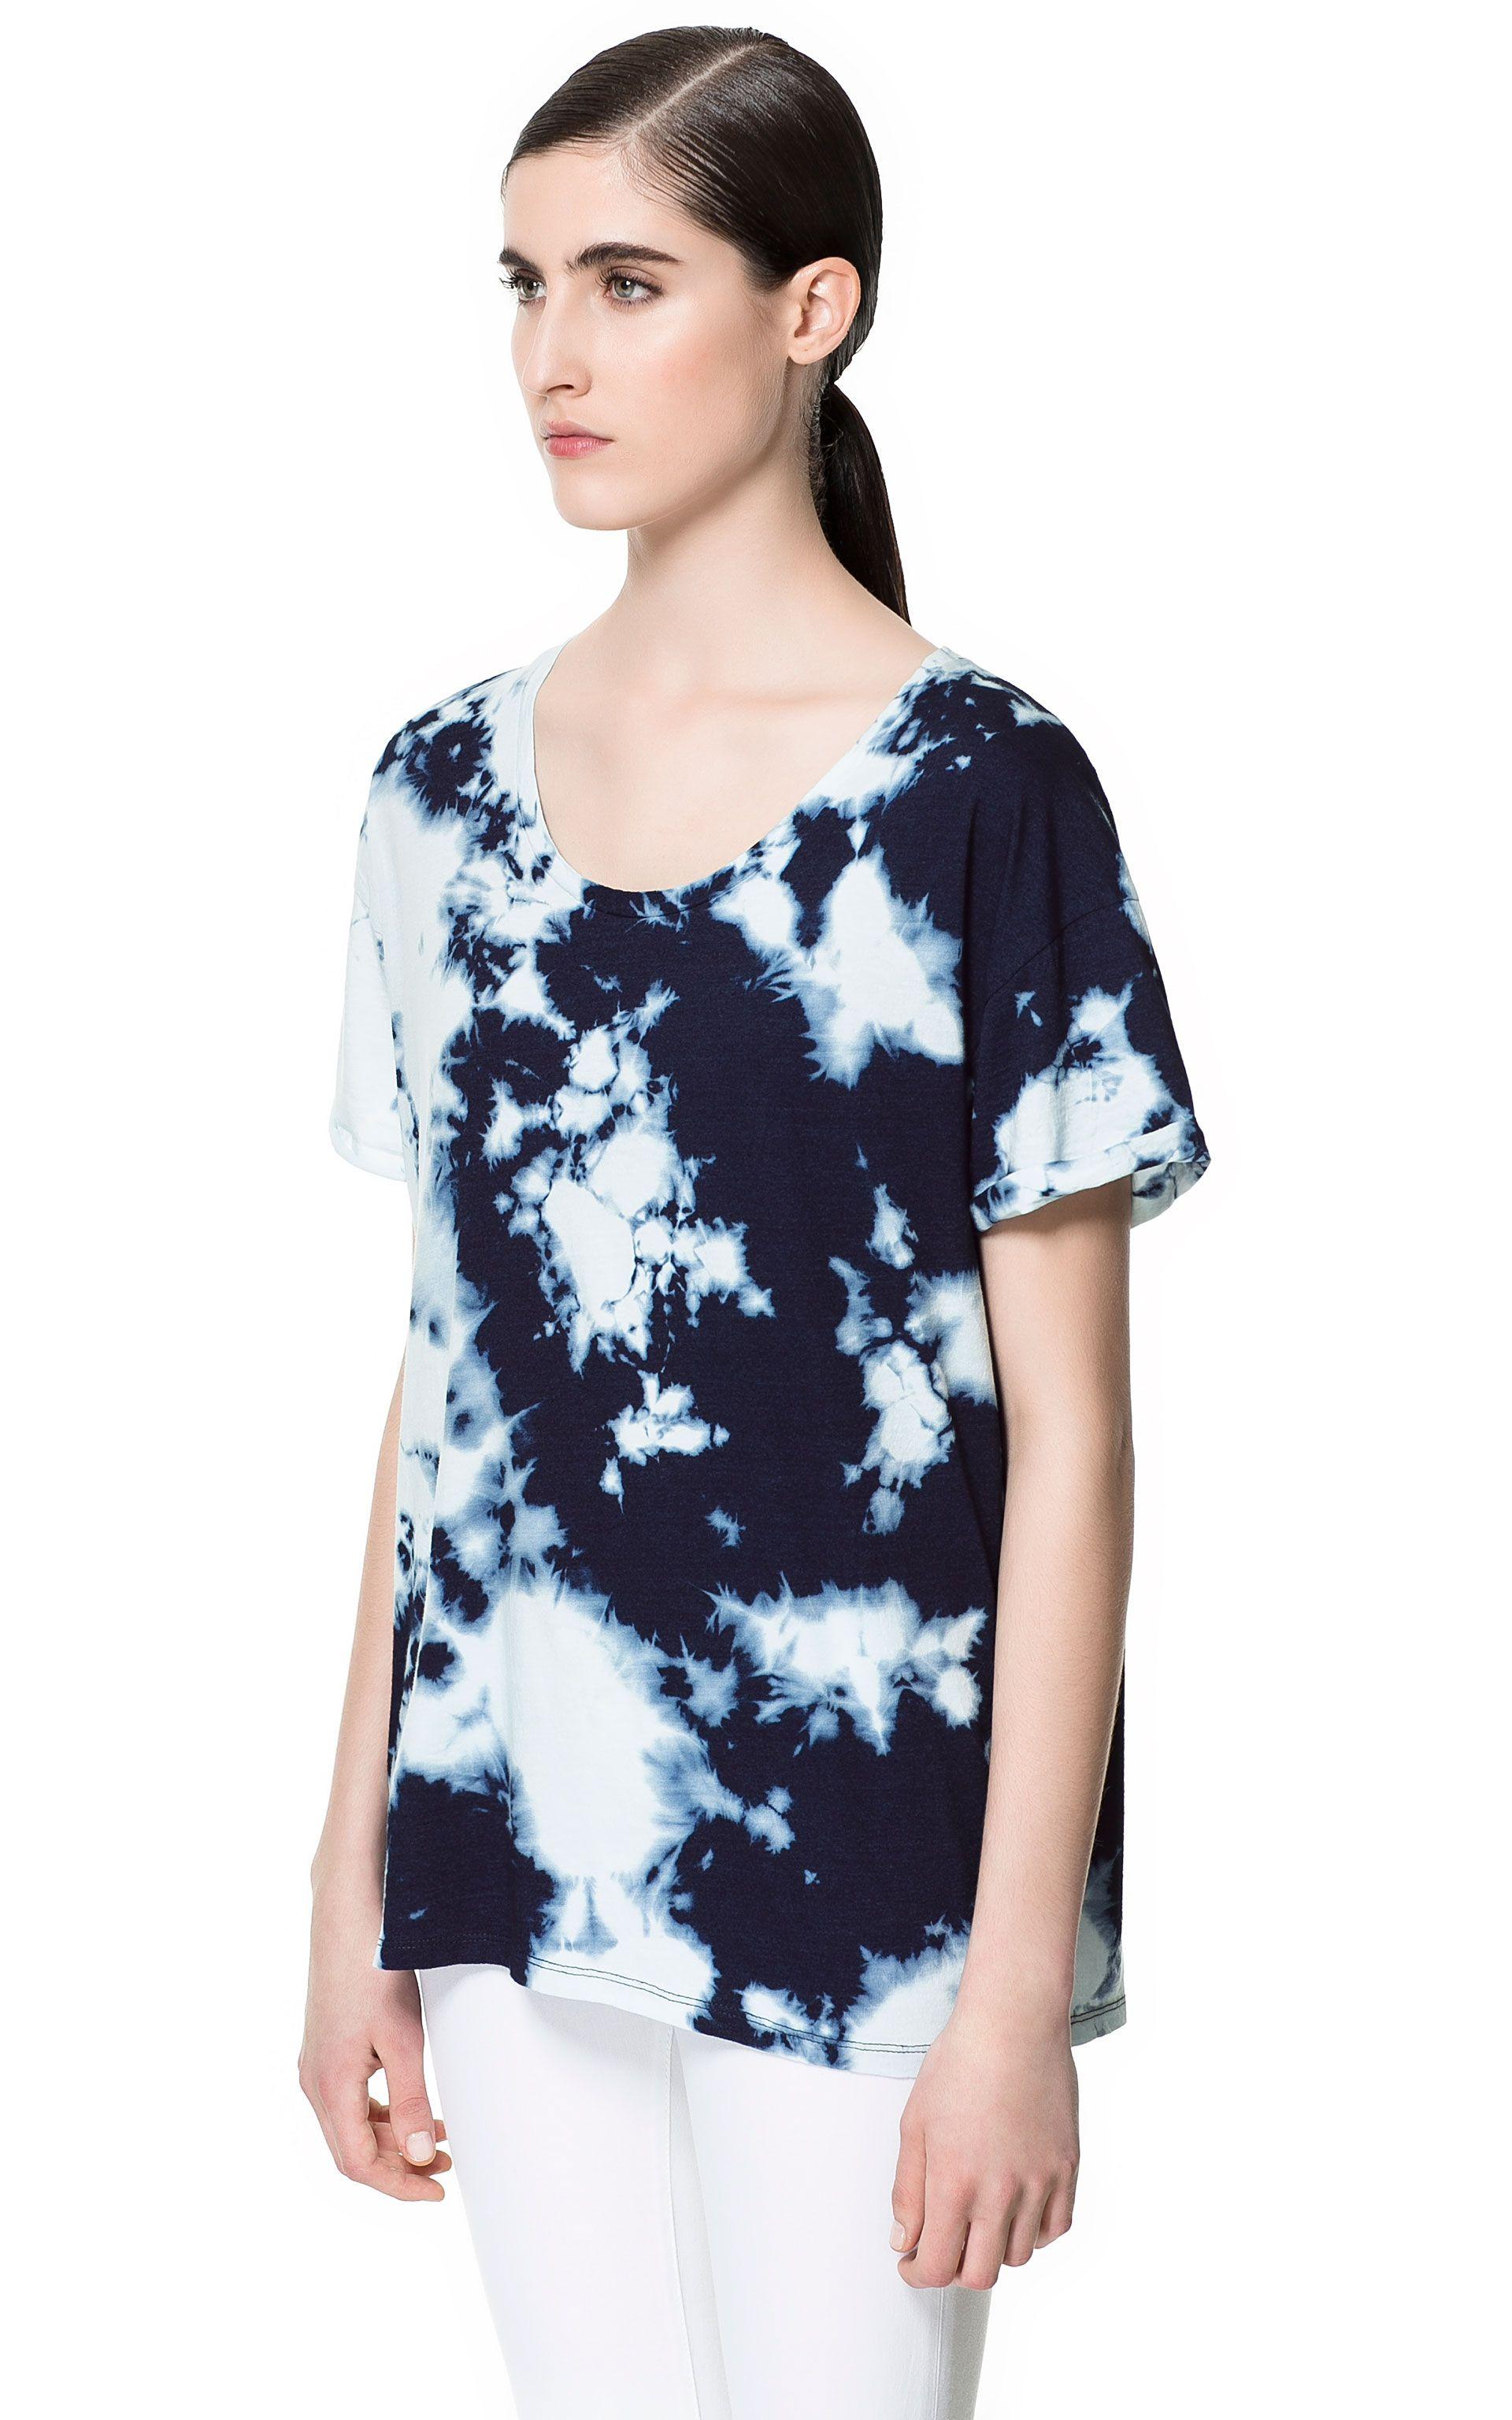 Mujer Camisetas Camiseta Algodón Zara Tie Dye EspañaTee xredCBoW